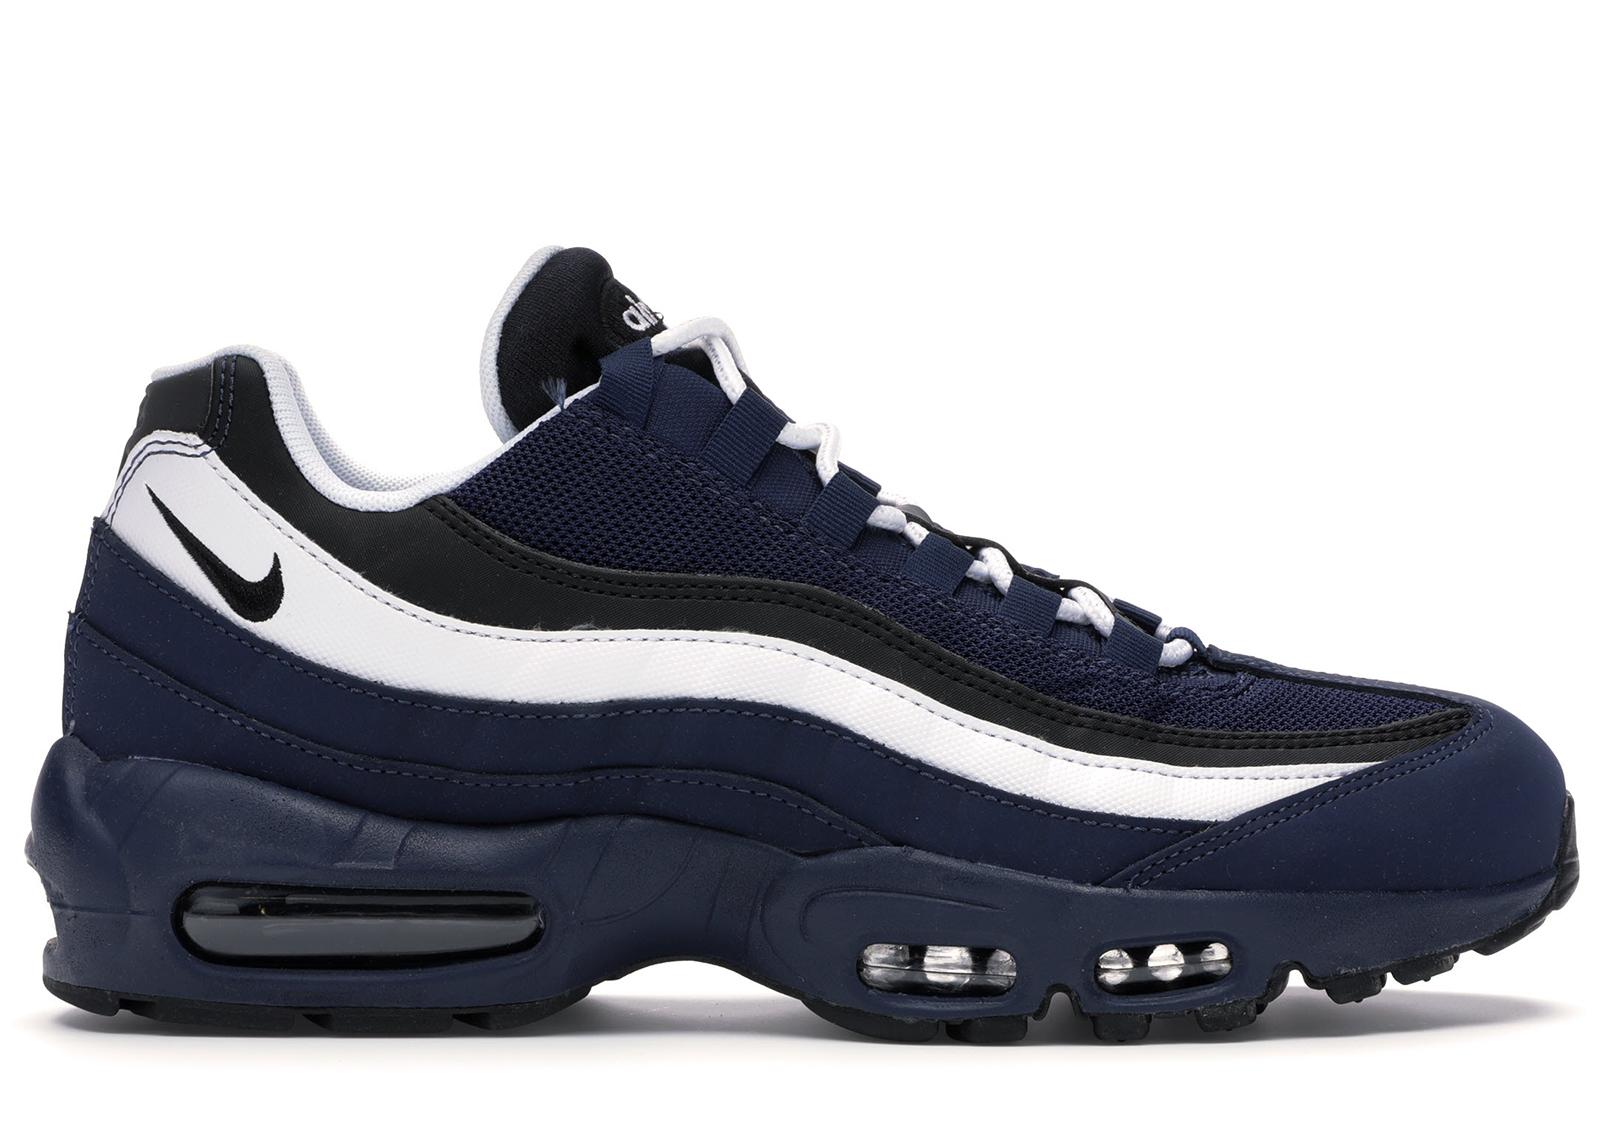 Nike Air Max 95 Essential Midnight Navy